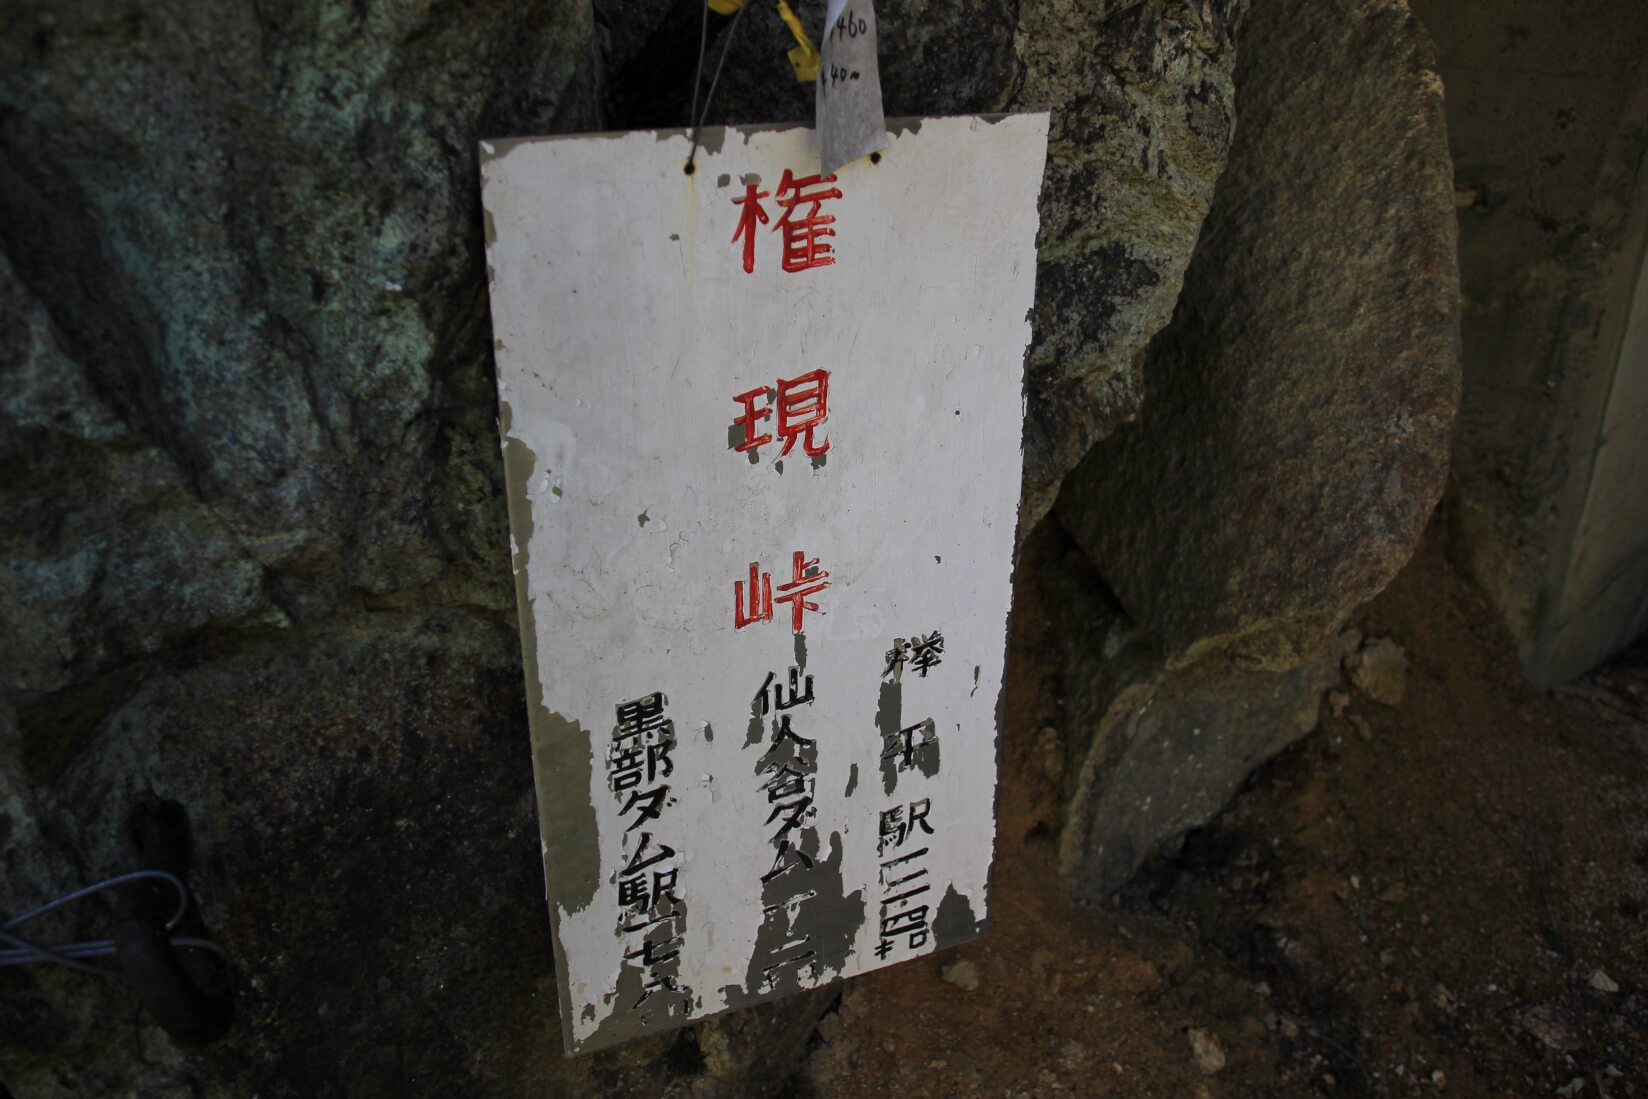 下ノ廊下、仙人谷ダム〜阿曽原区間